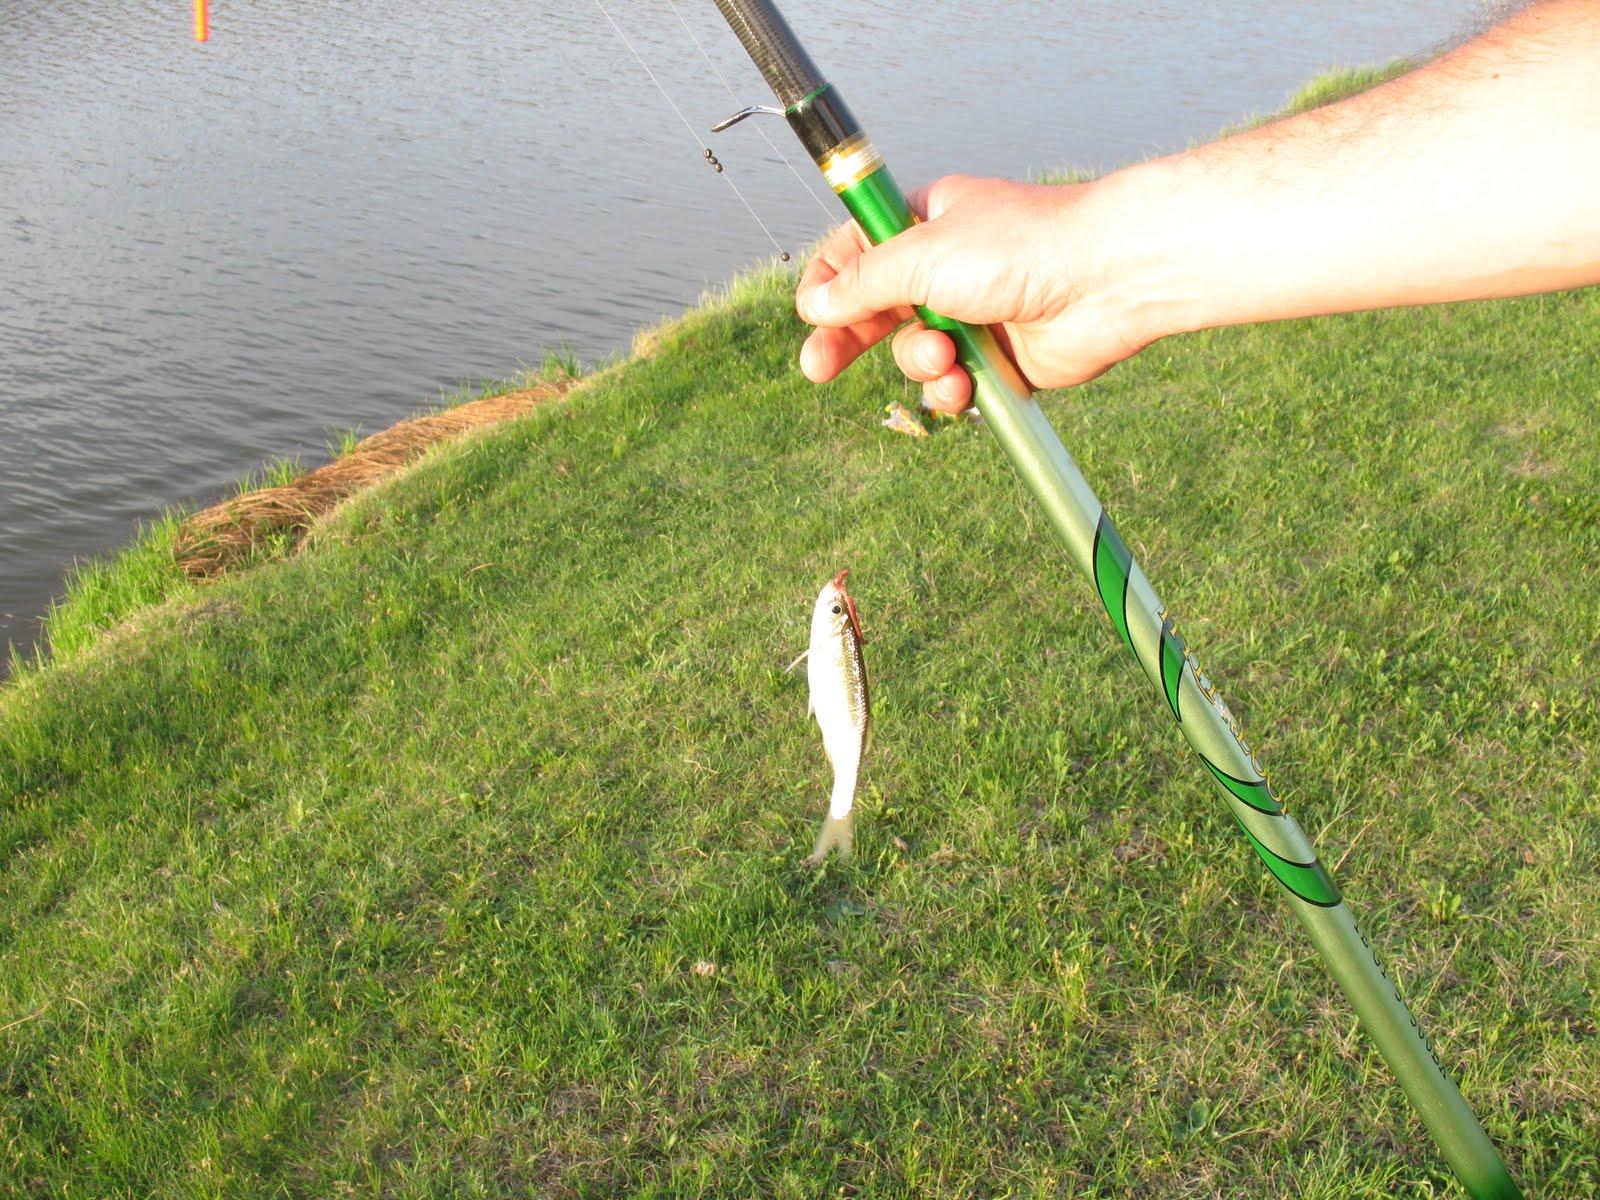 собираем спиннинг на рыбалку